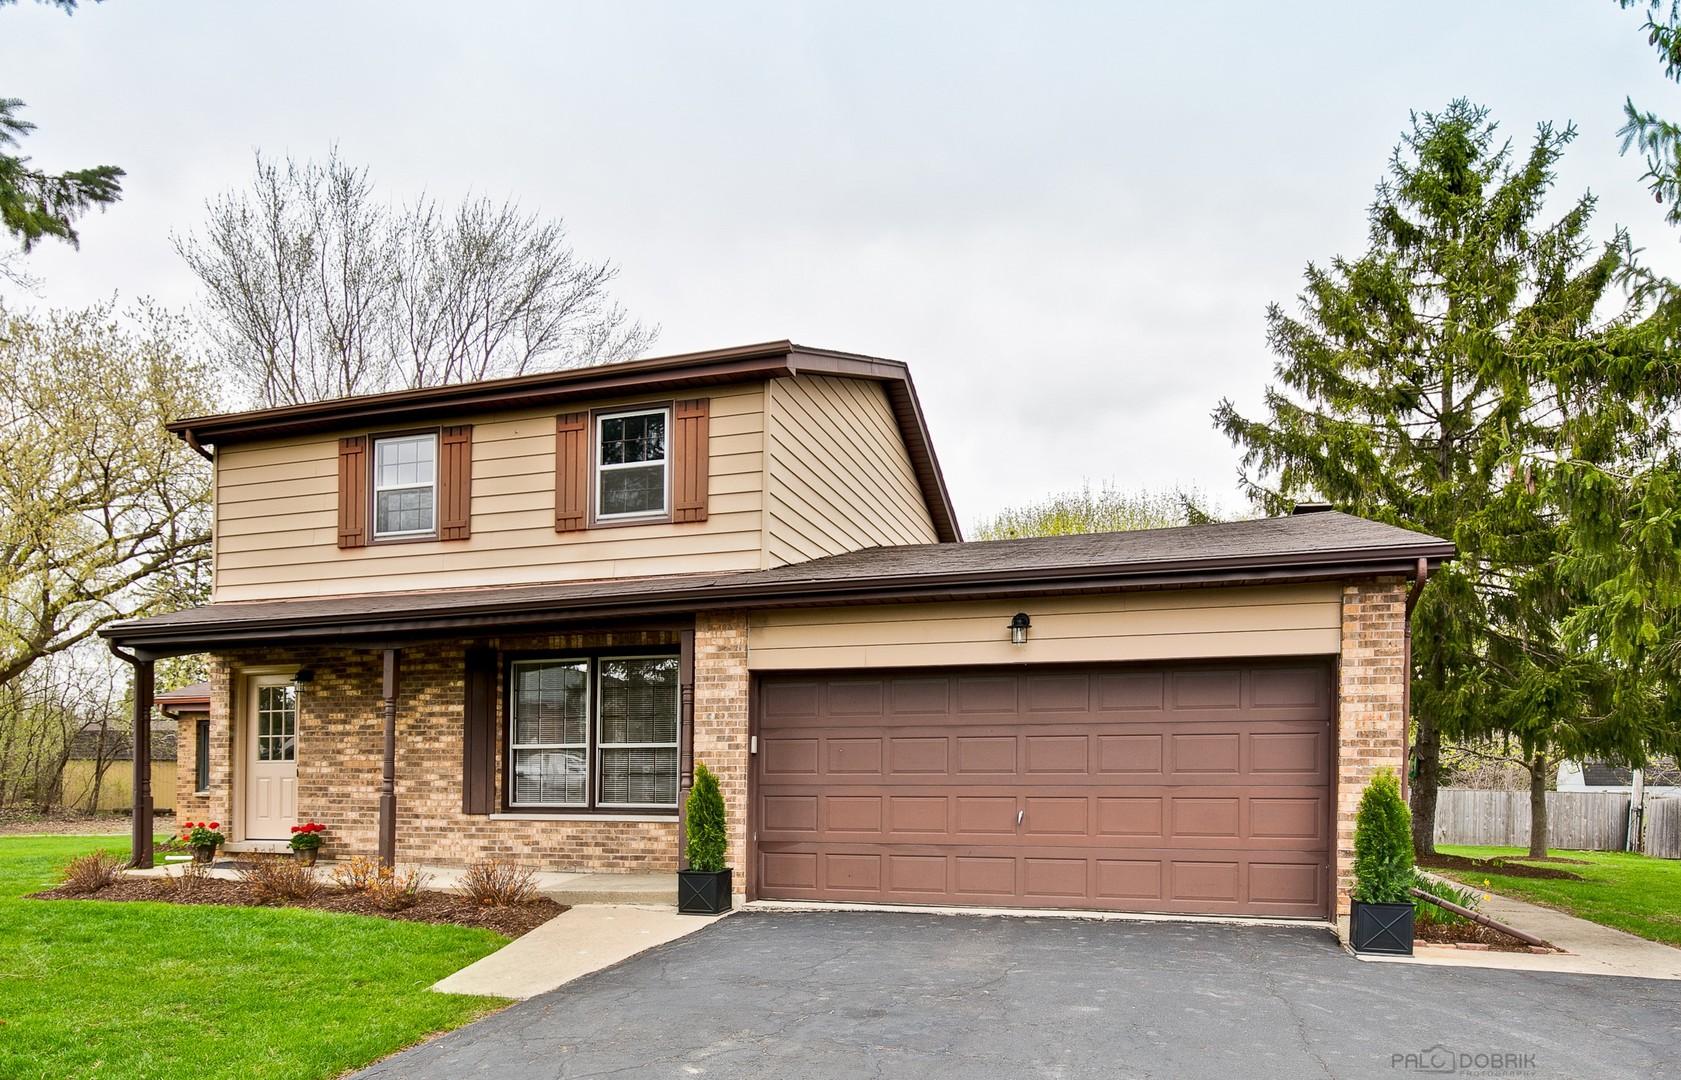 815 West Blodgett Avenue, Lake Bluff, Illinois 60044